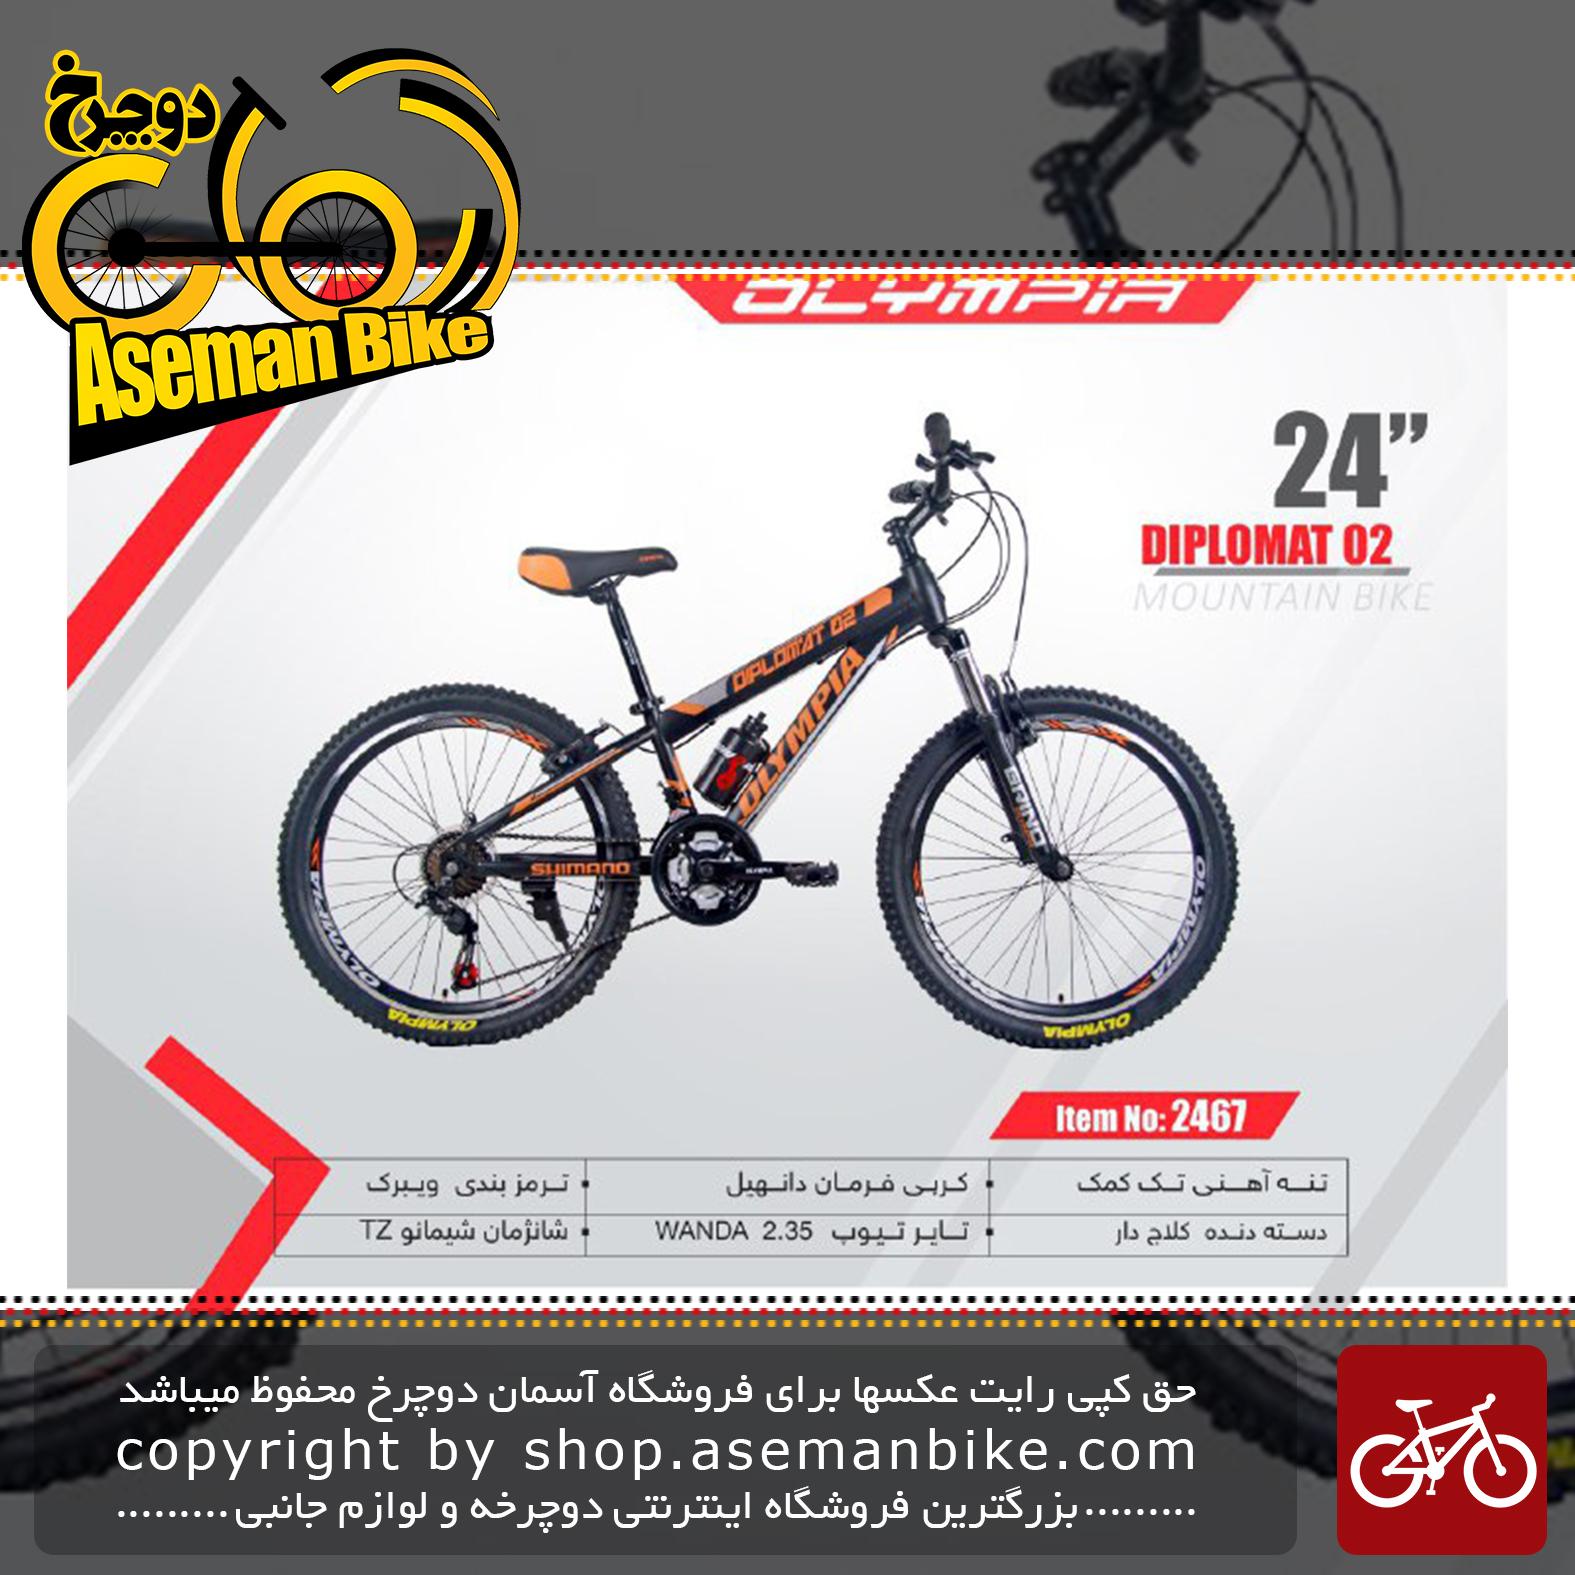 دوچرخه کوهستان المپیا سایز24 مدل دیپلومات OLYMPIA SIZE 24 DIPOMAT 02 02